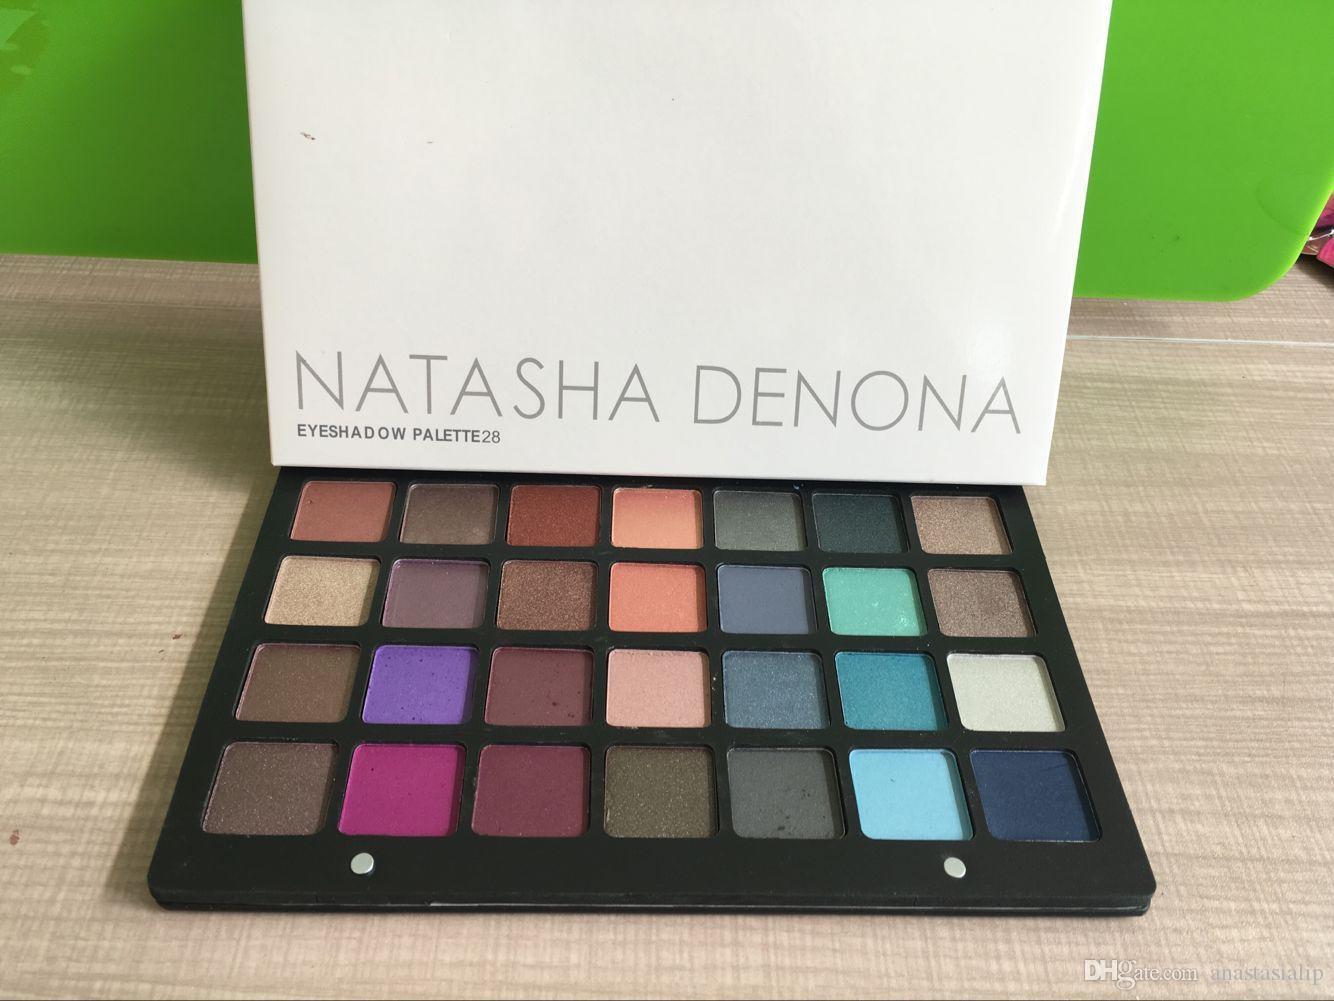 Natasha Denona Purple-Blue 28 Colors Eyeshadow Palette